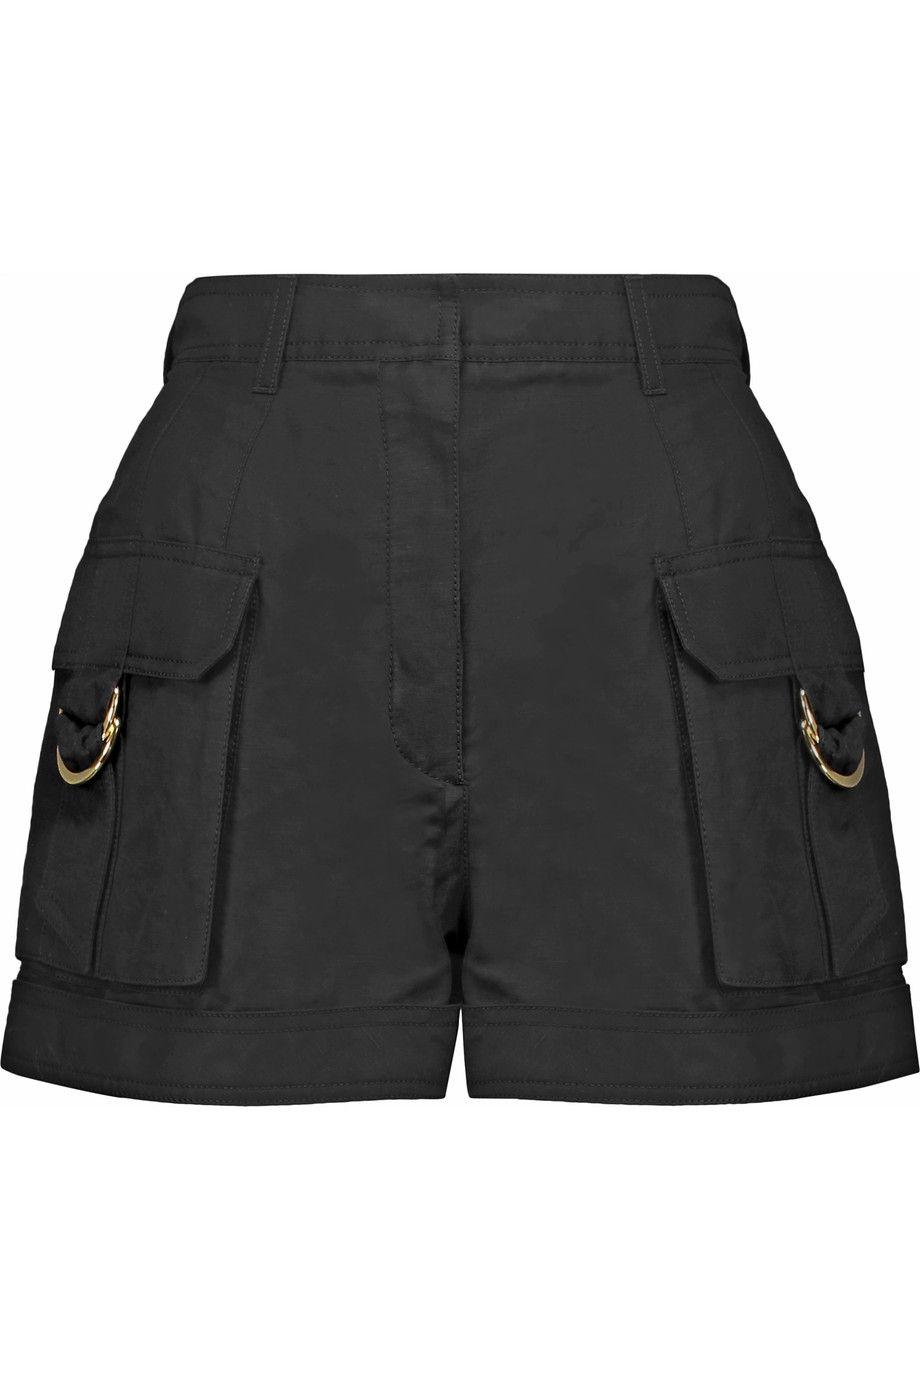 Balmain Linen And Cotton Blend Shorts Modesens Fashion Clothes Women Clothes Clothes Design [ 1380 x 920 Pixel ]